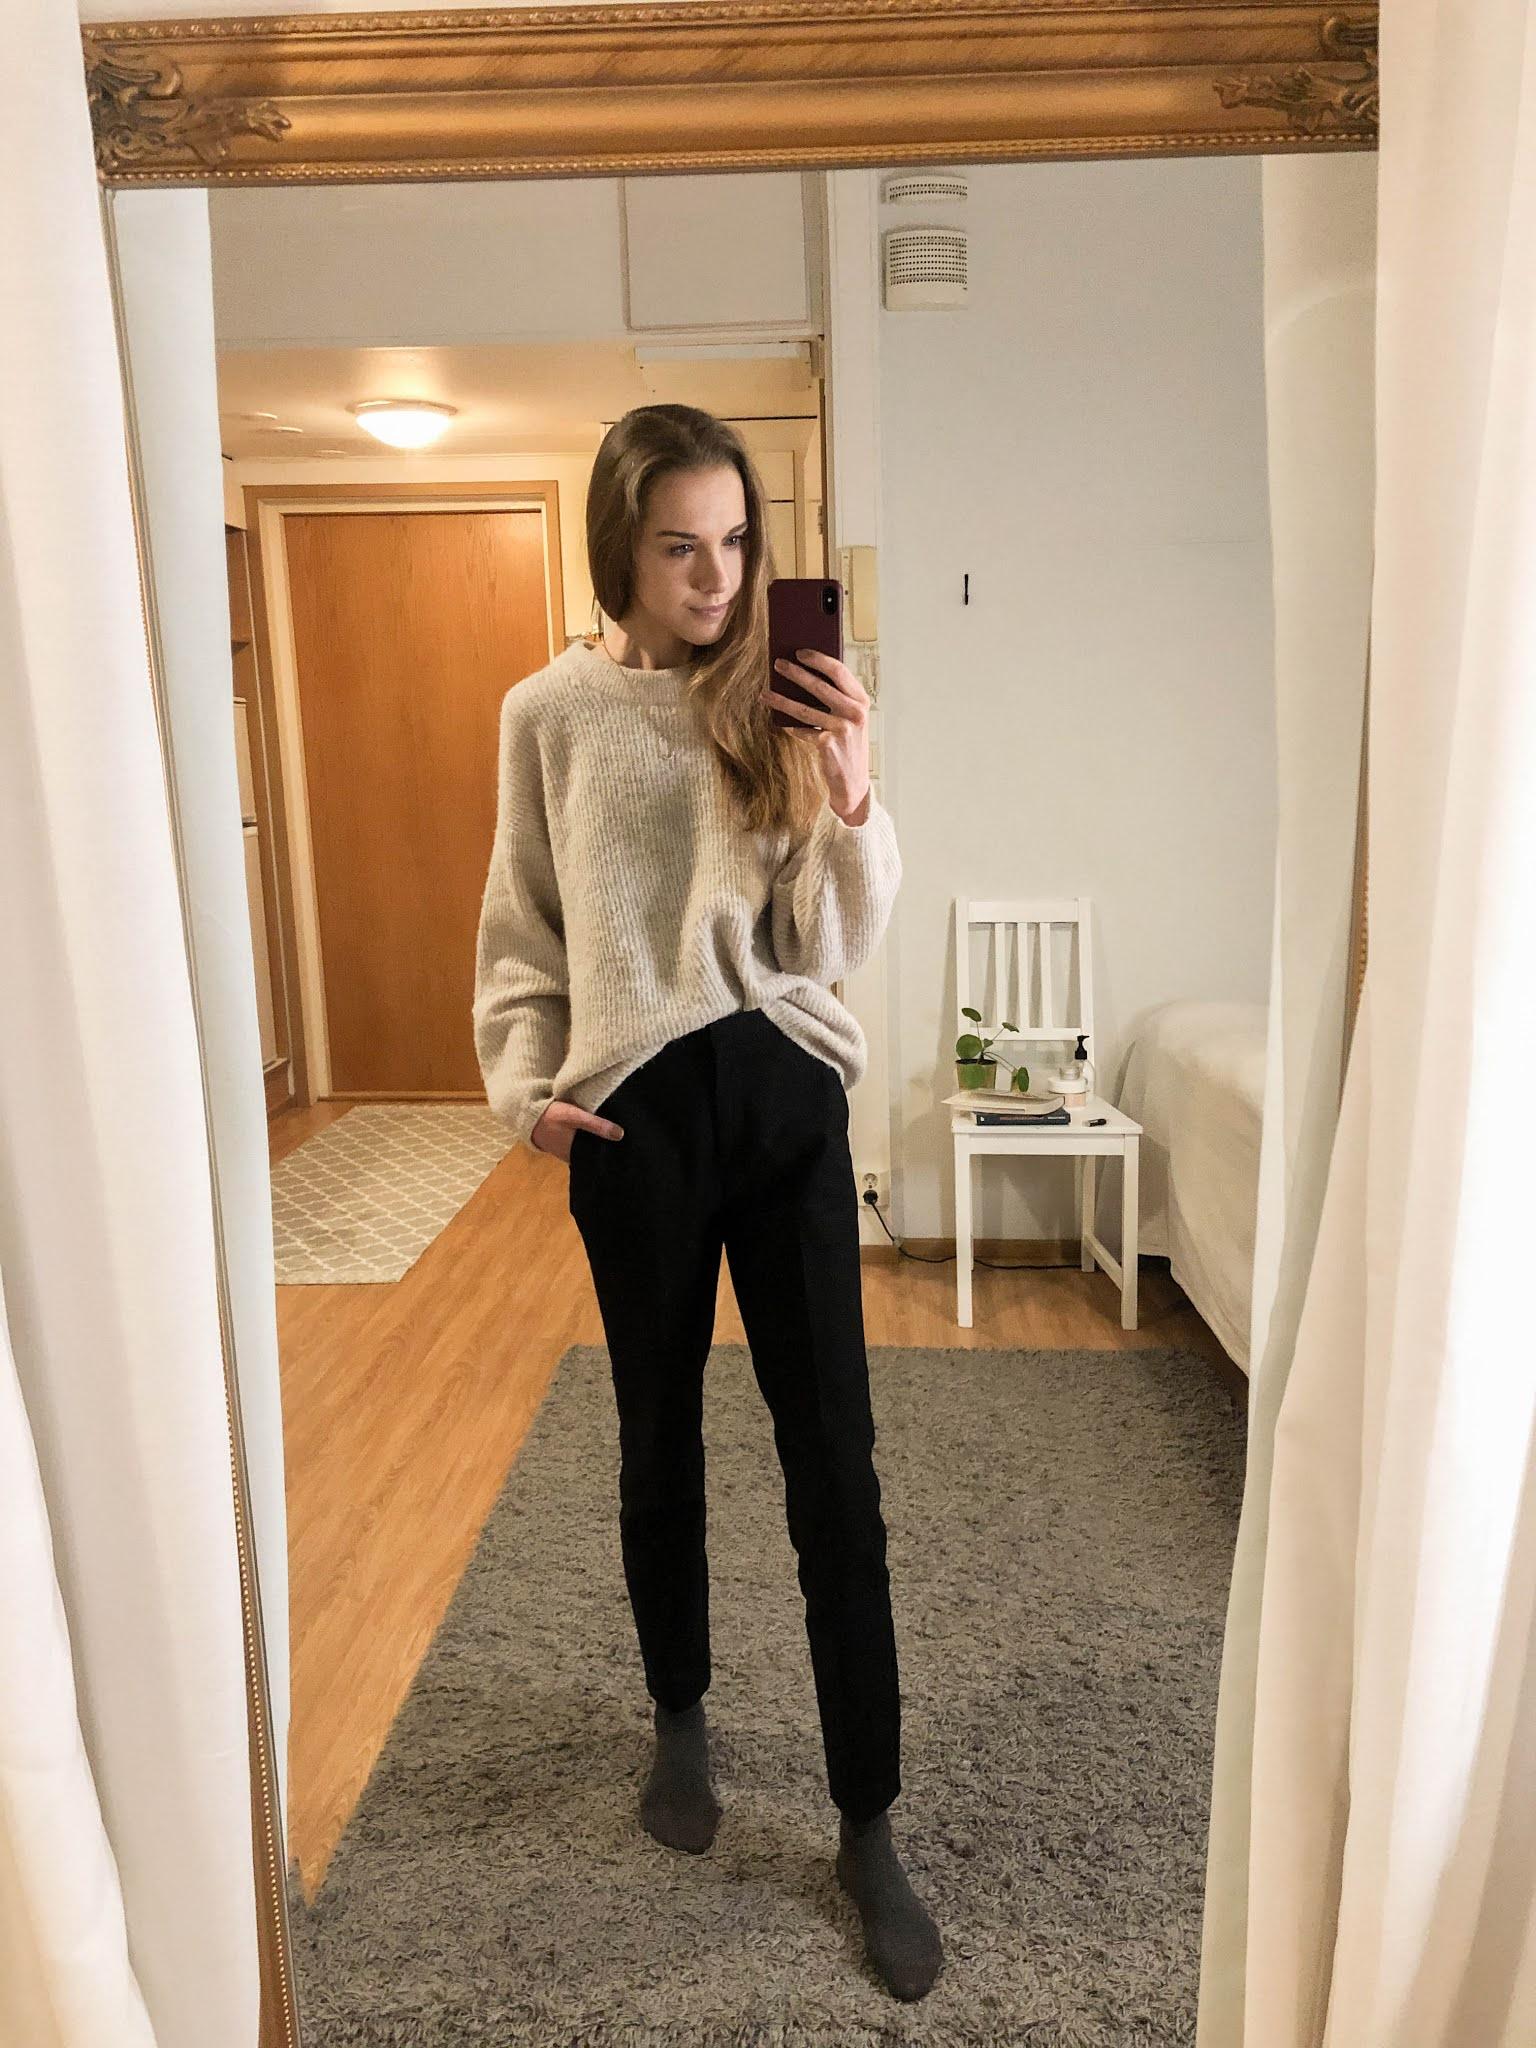 Asuinspiraatio, muotibloggaaja // Outfit inspiration, fashion blogger